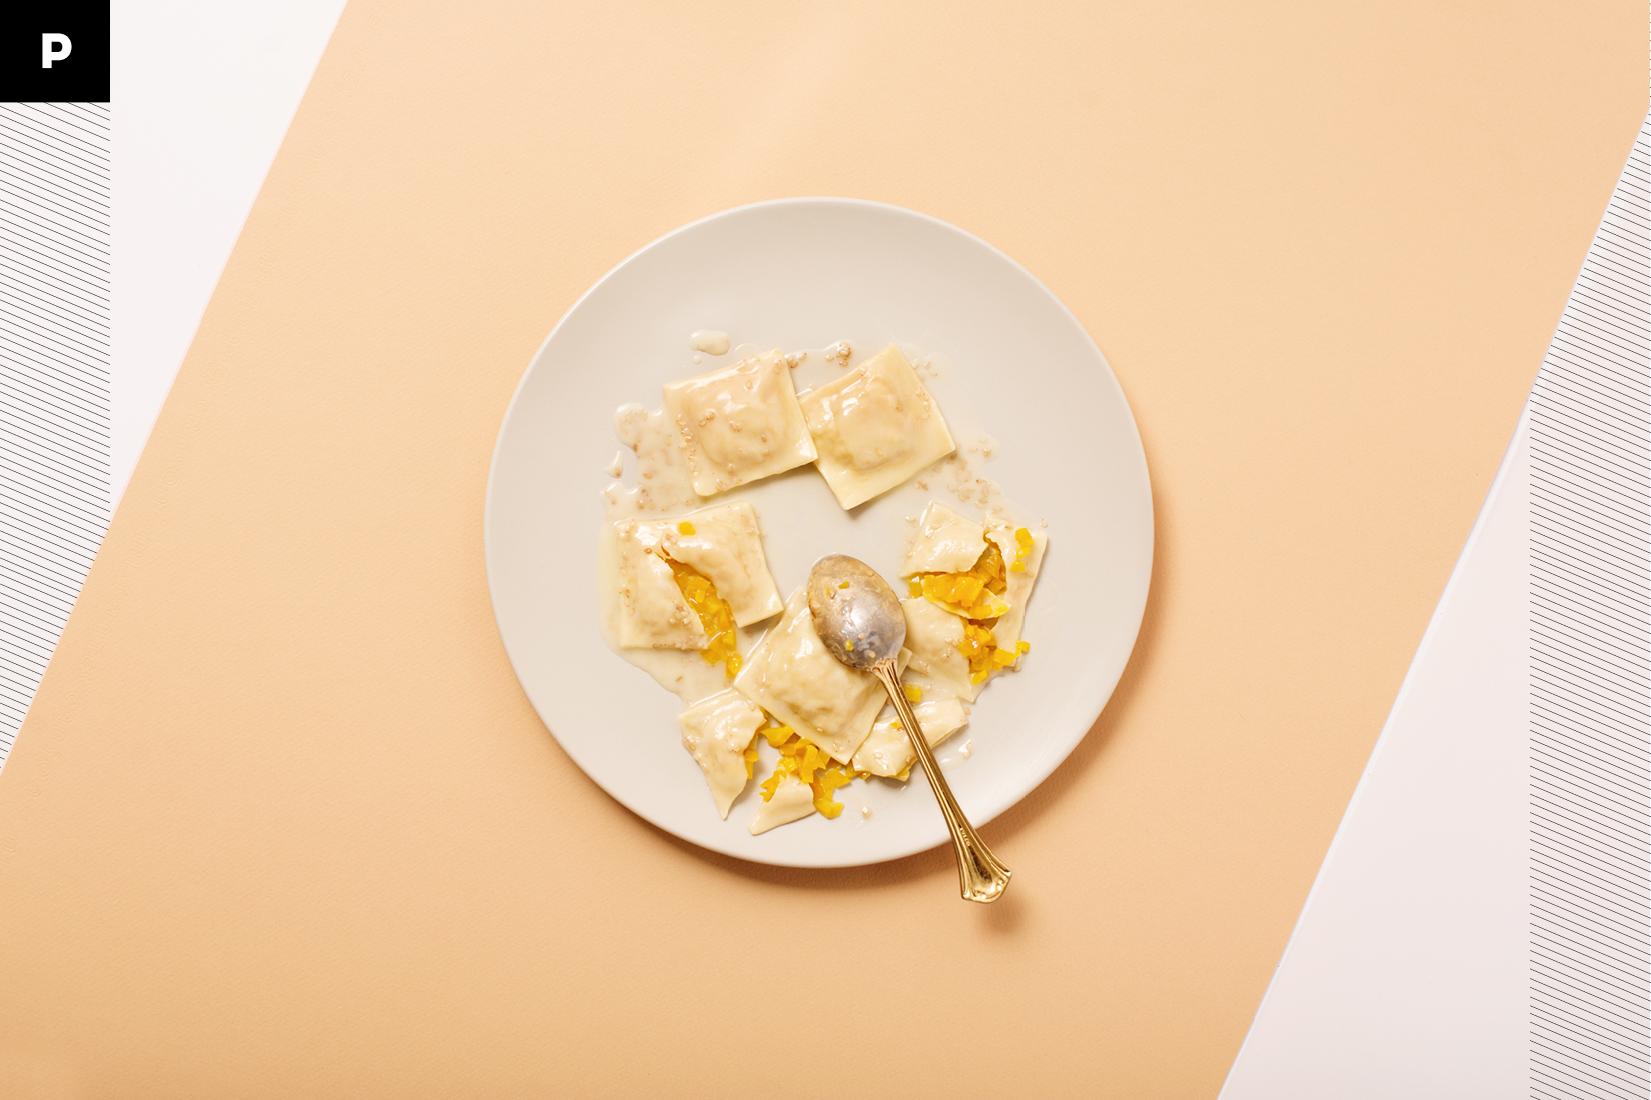 Creative Direction & Styling: Liz Gardner Chef: Jon Wipfli of  The Minnesota Spoon  Photo:  Eliesa Johnson